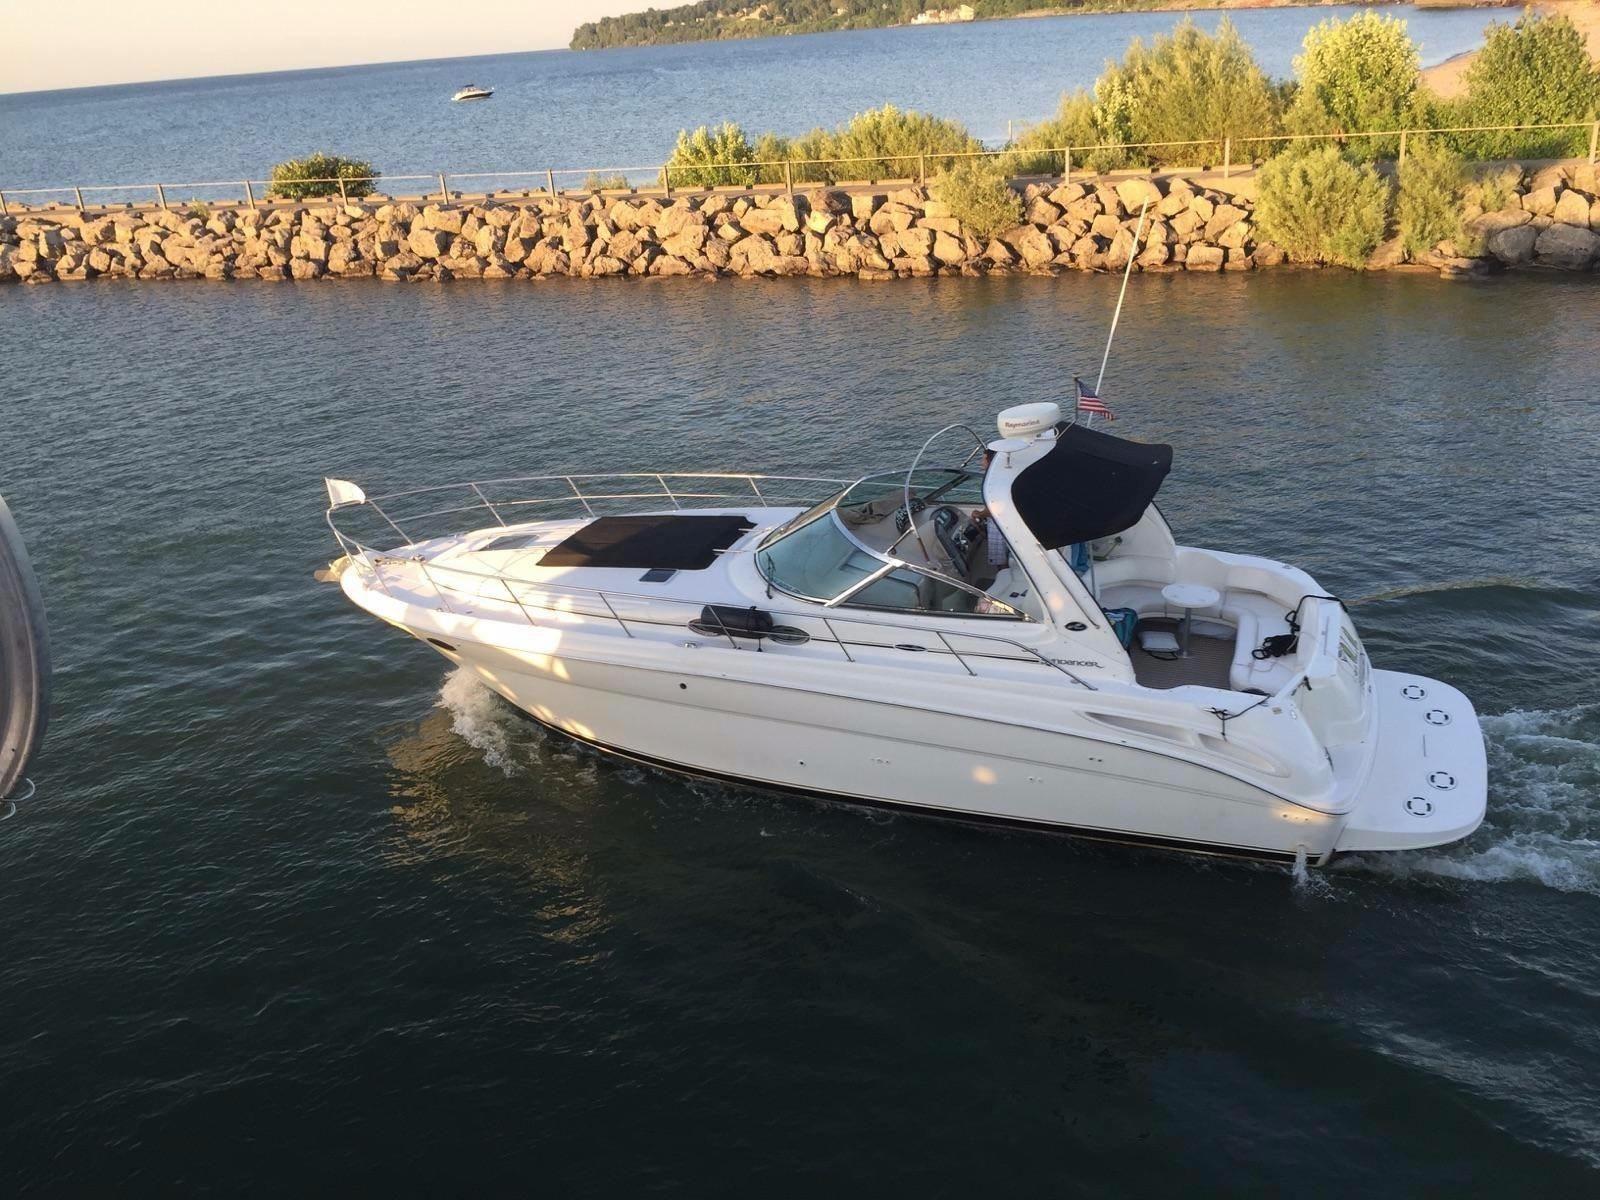 2002 Sea Ray 380 Sundancer Power Boat For Sale Www